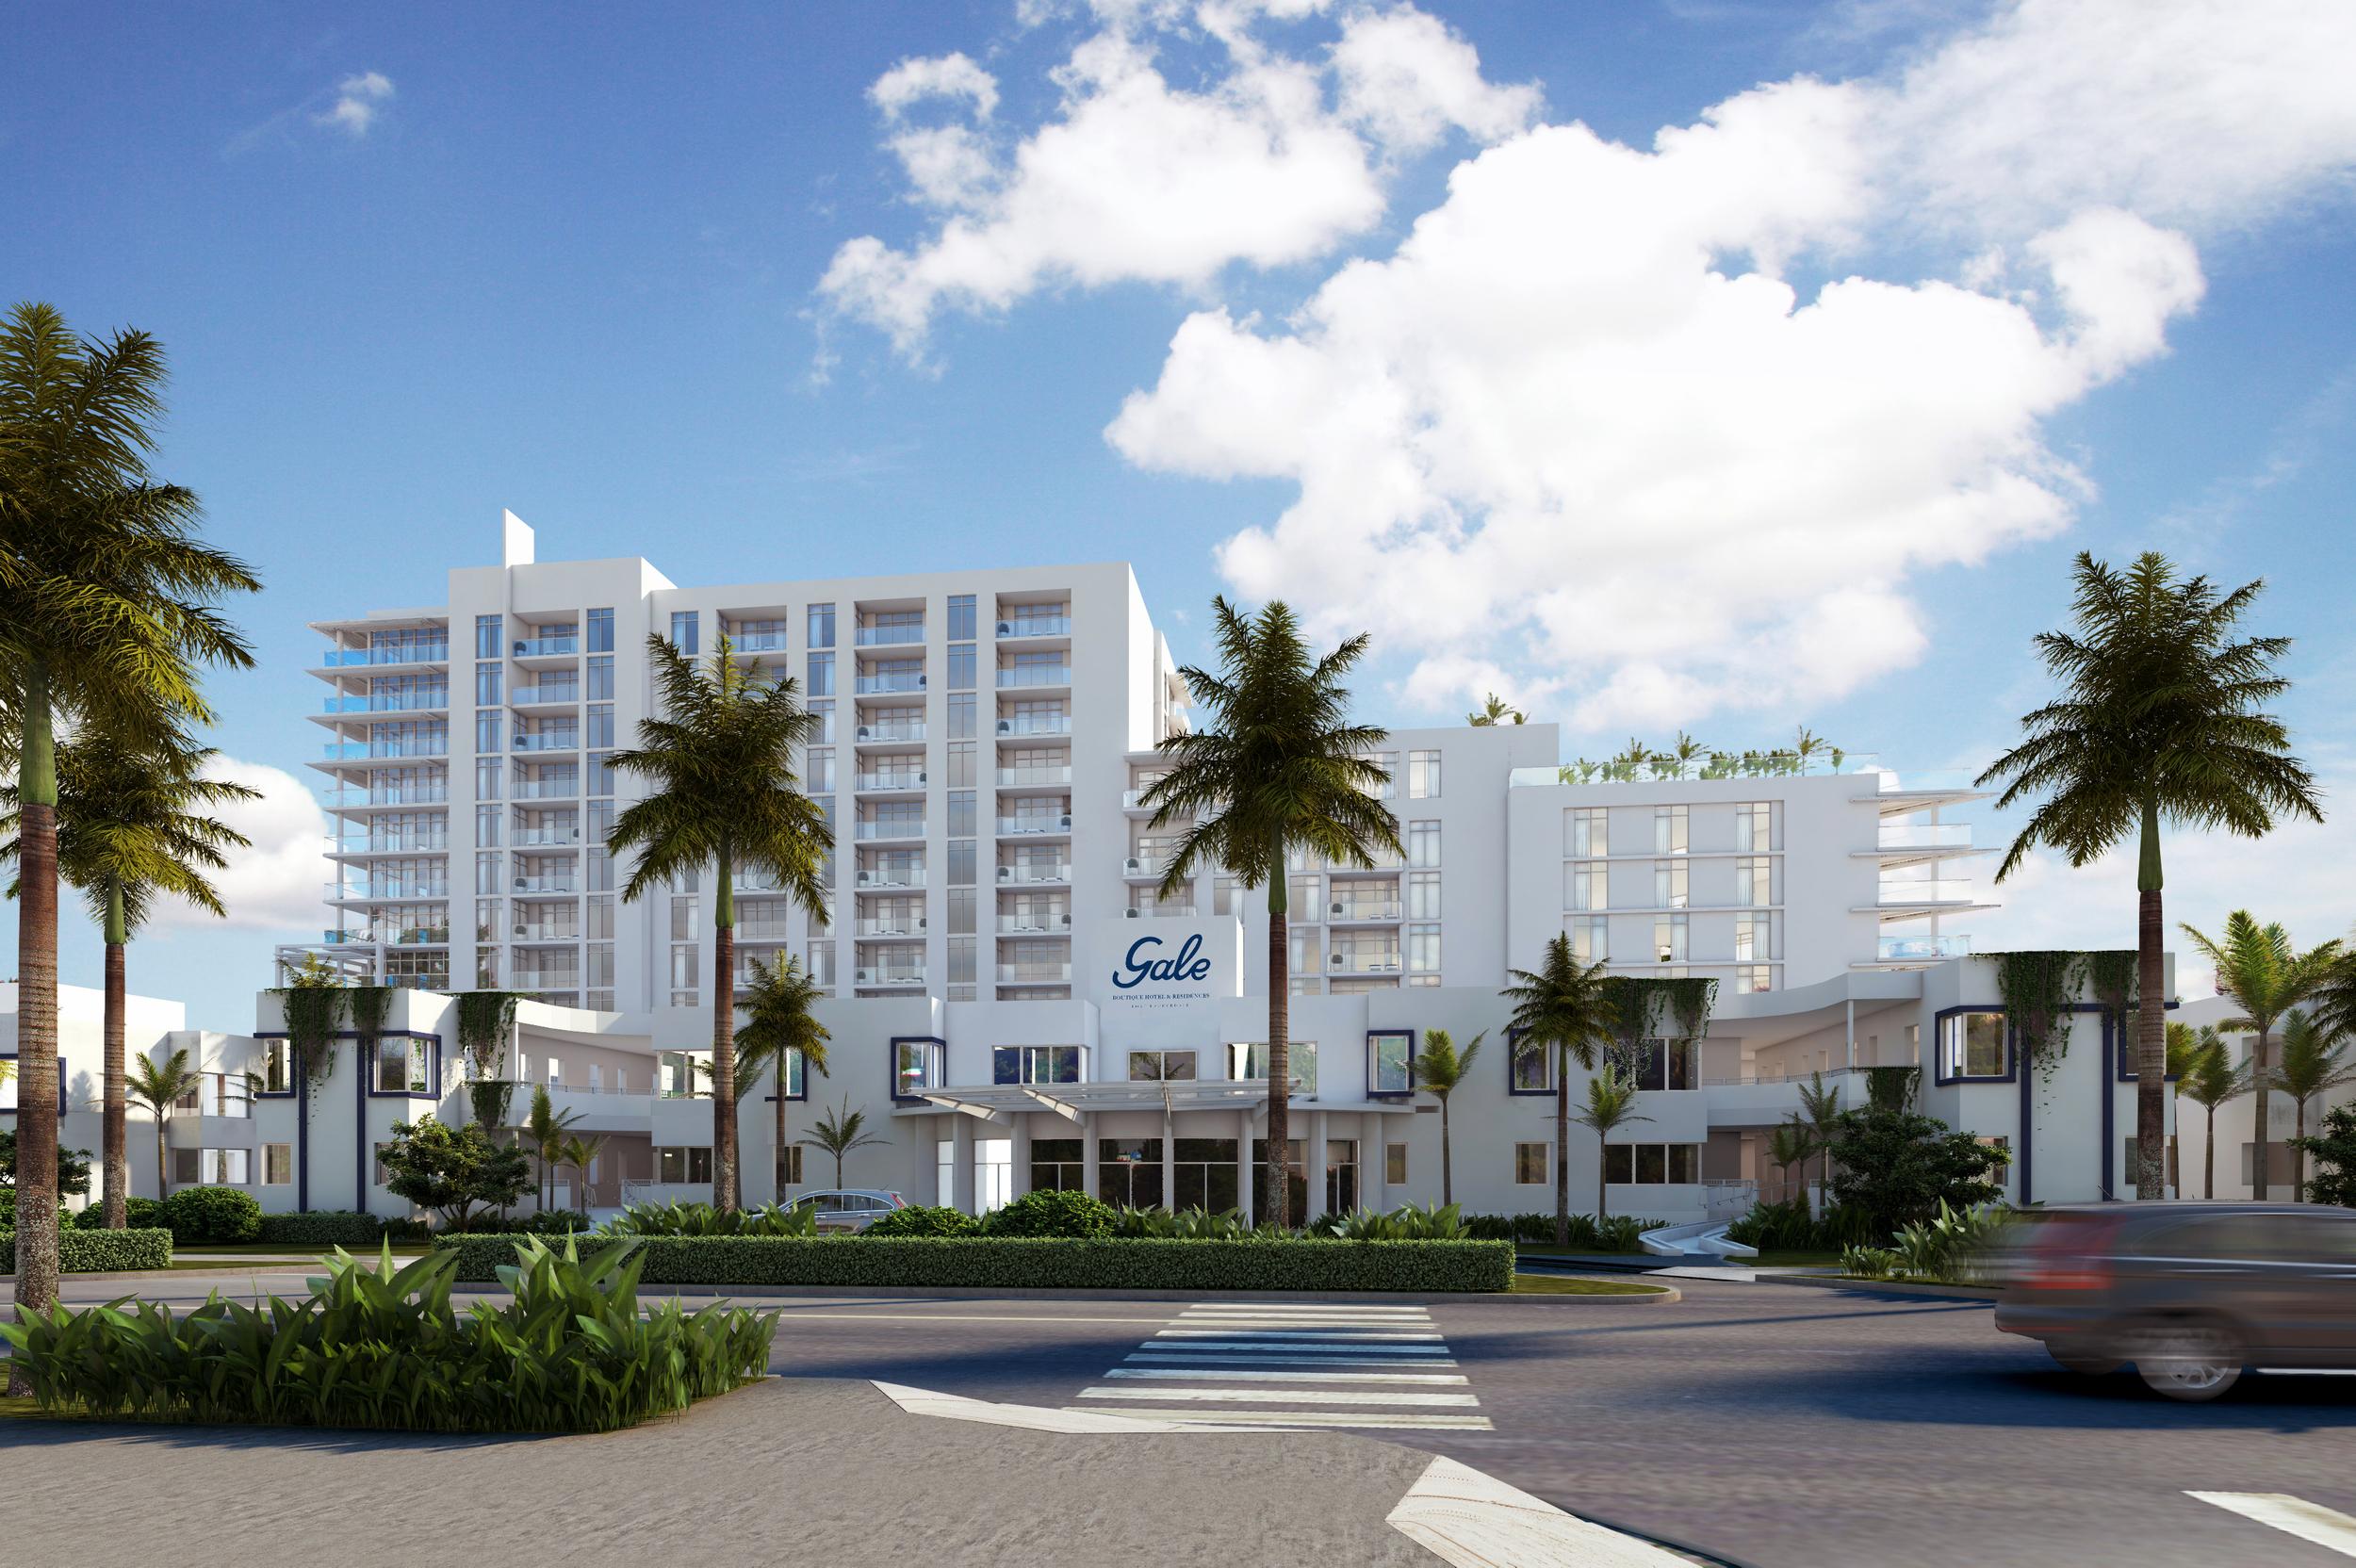 Gale-Fort-Lauderdale-Beach-Front.jpg